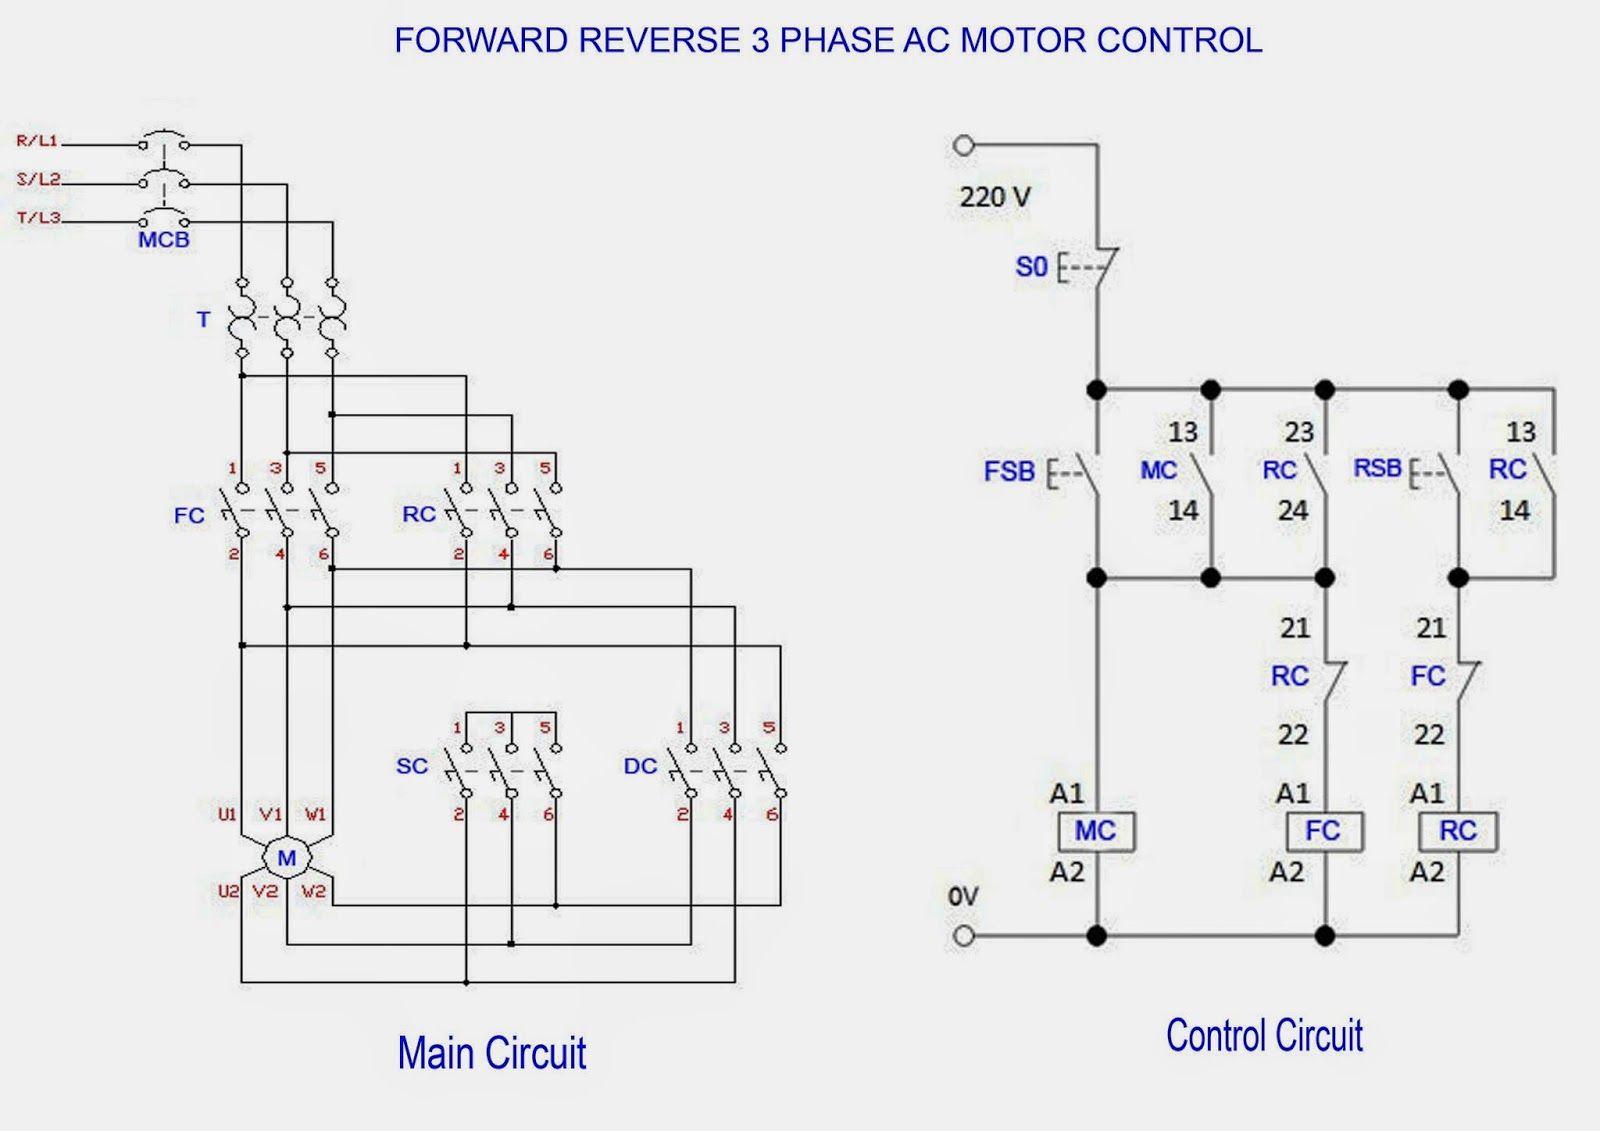 medium resolution of forward reverse 3 phase ac motor control wiring diagram